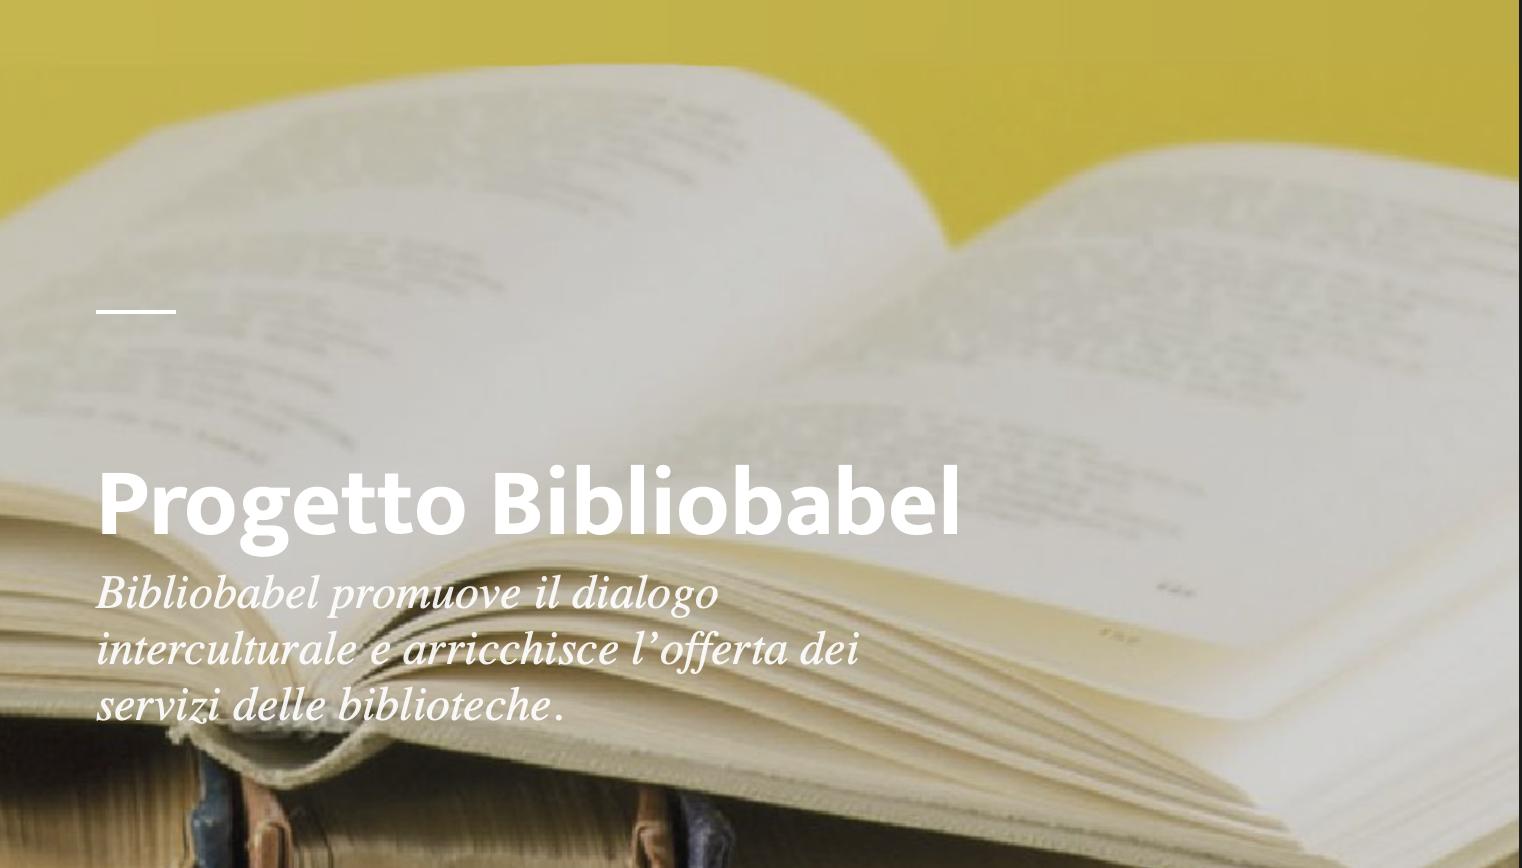 BiblioBabel